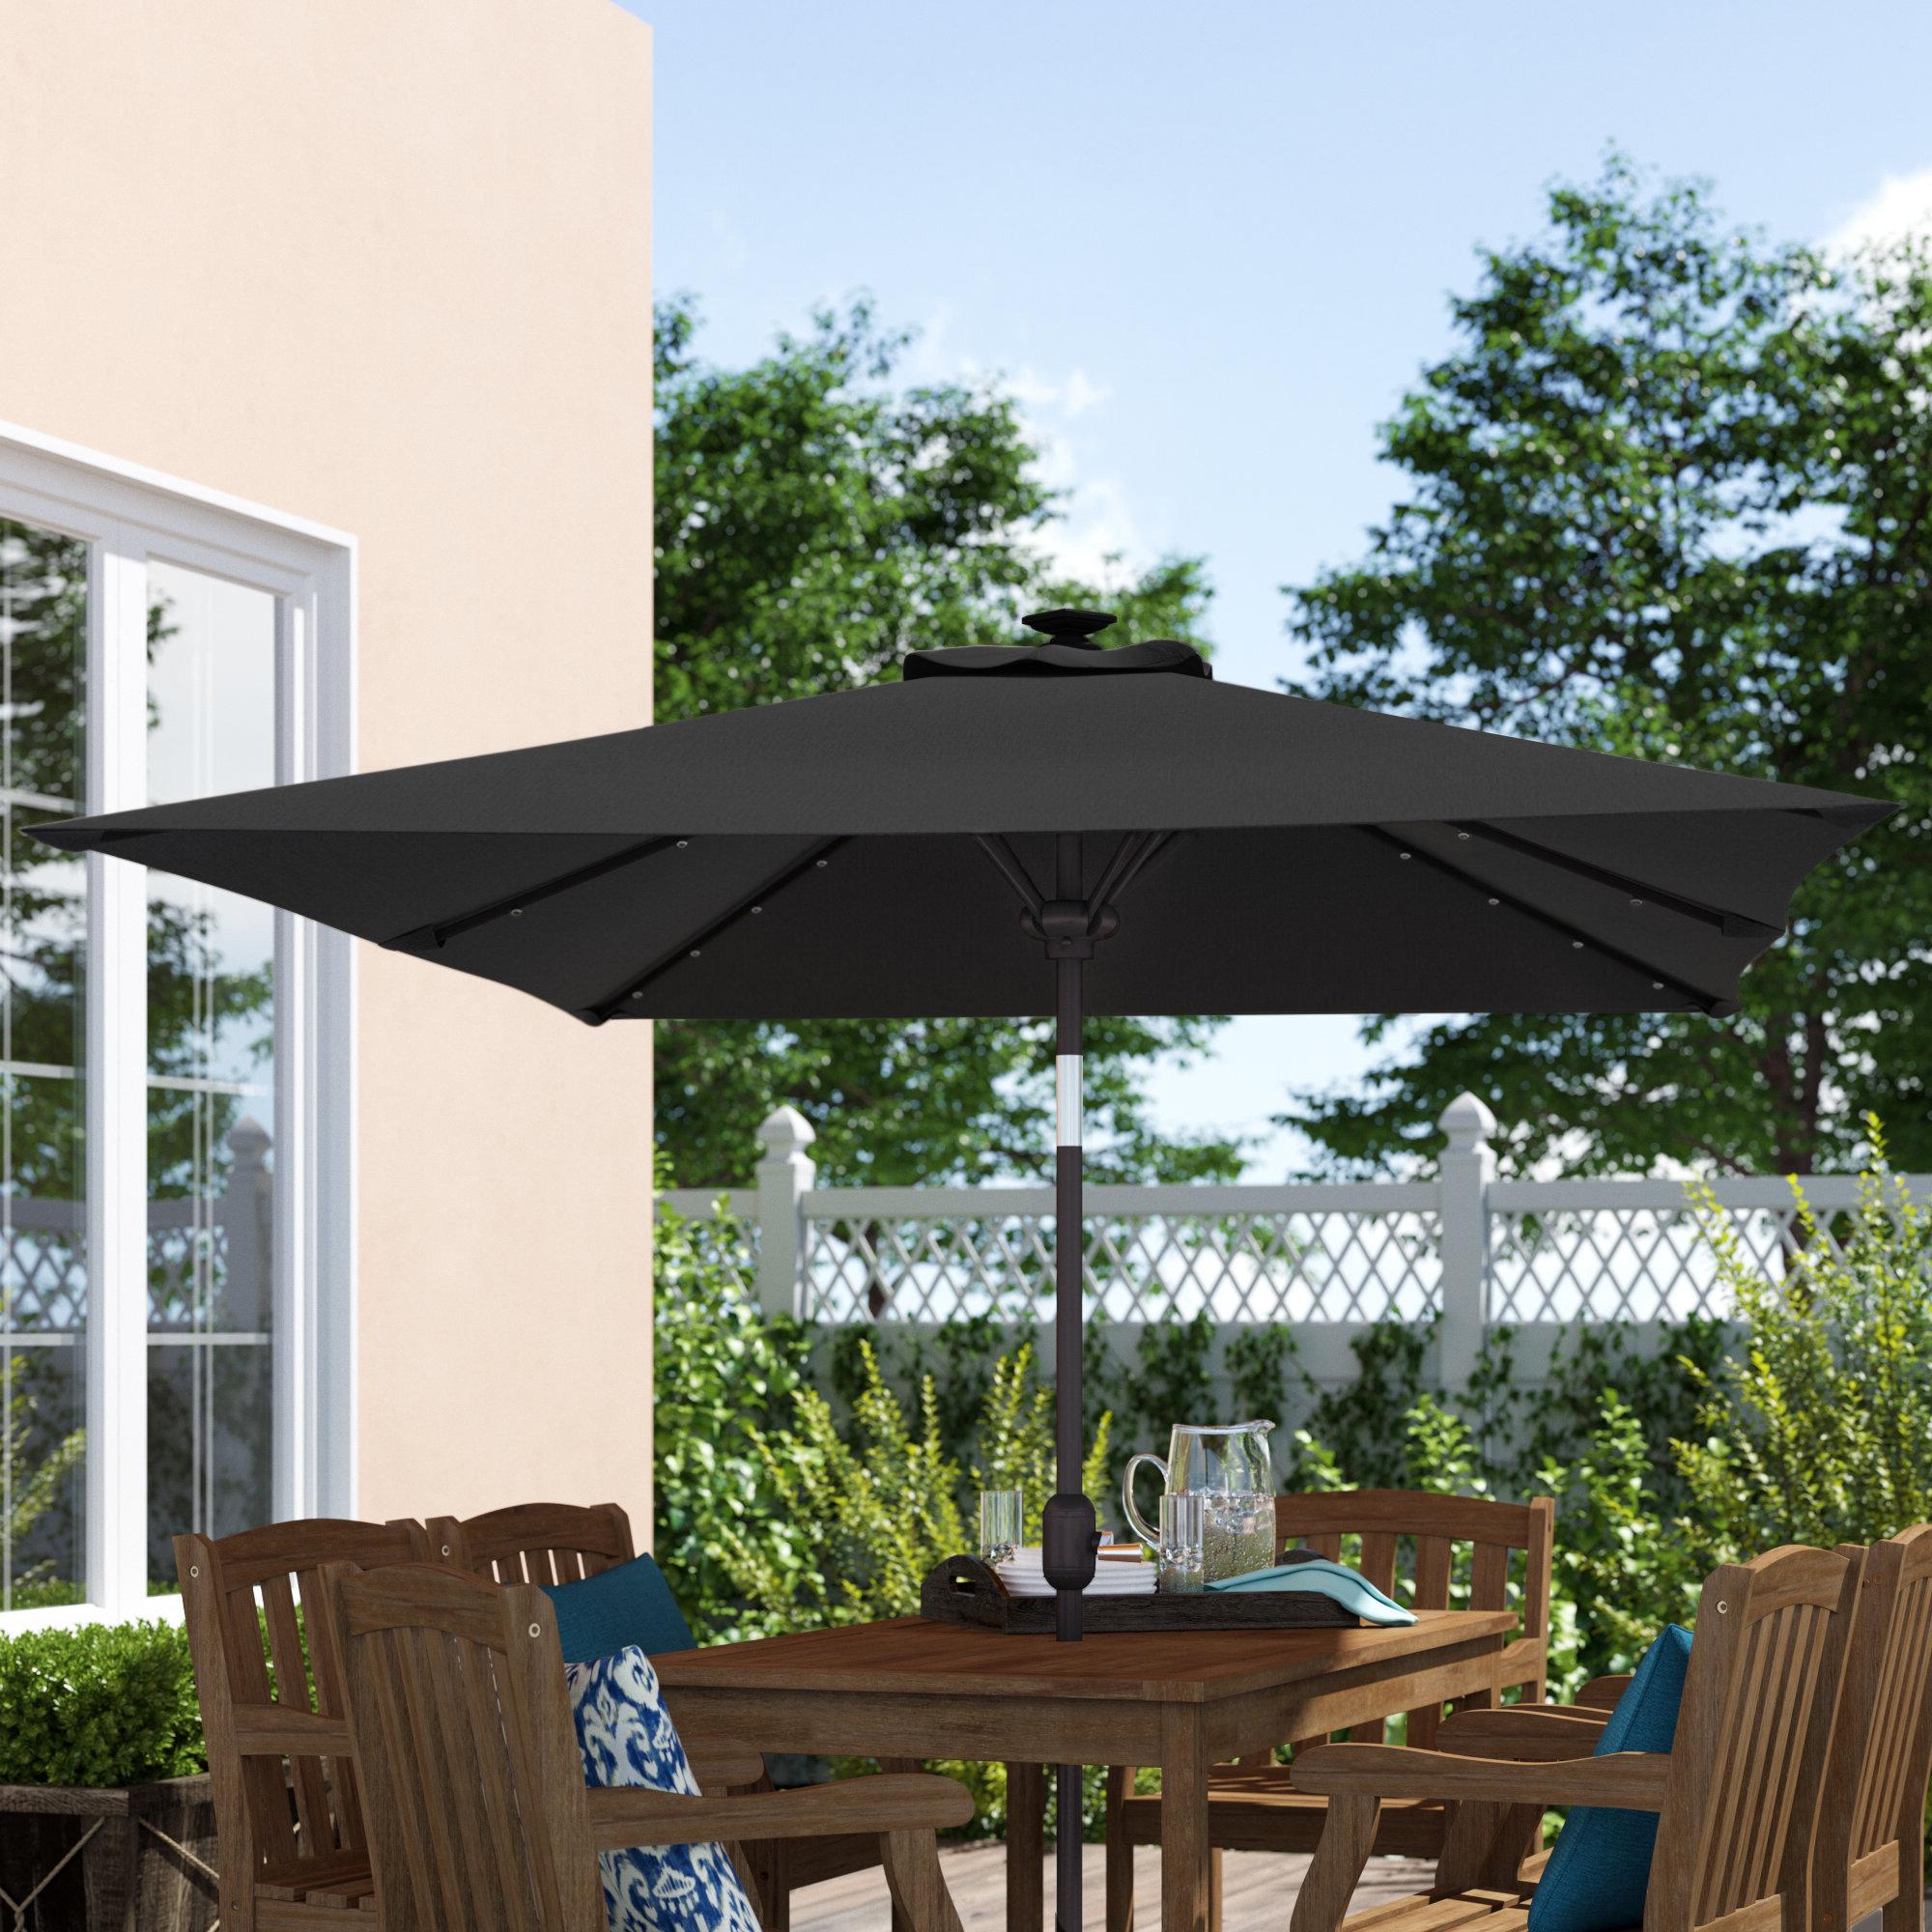 "Most Recent Eliana Solar Lighted Sunshade Tilt Crank 10' X 6'6"" Rectangular Market  Umbrella With Northfleet Rectangular Market Umbrellas (View 11 of 20)"